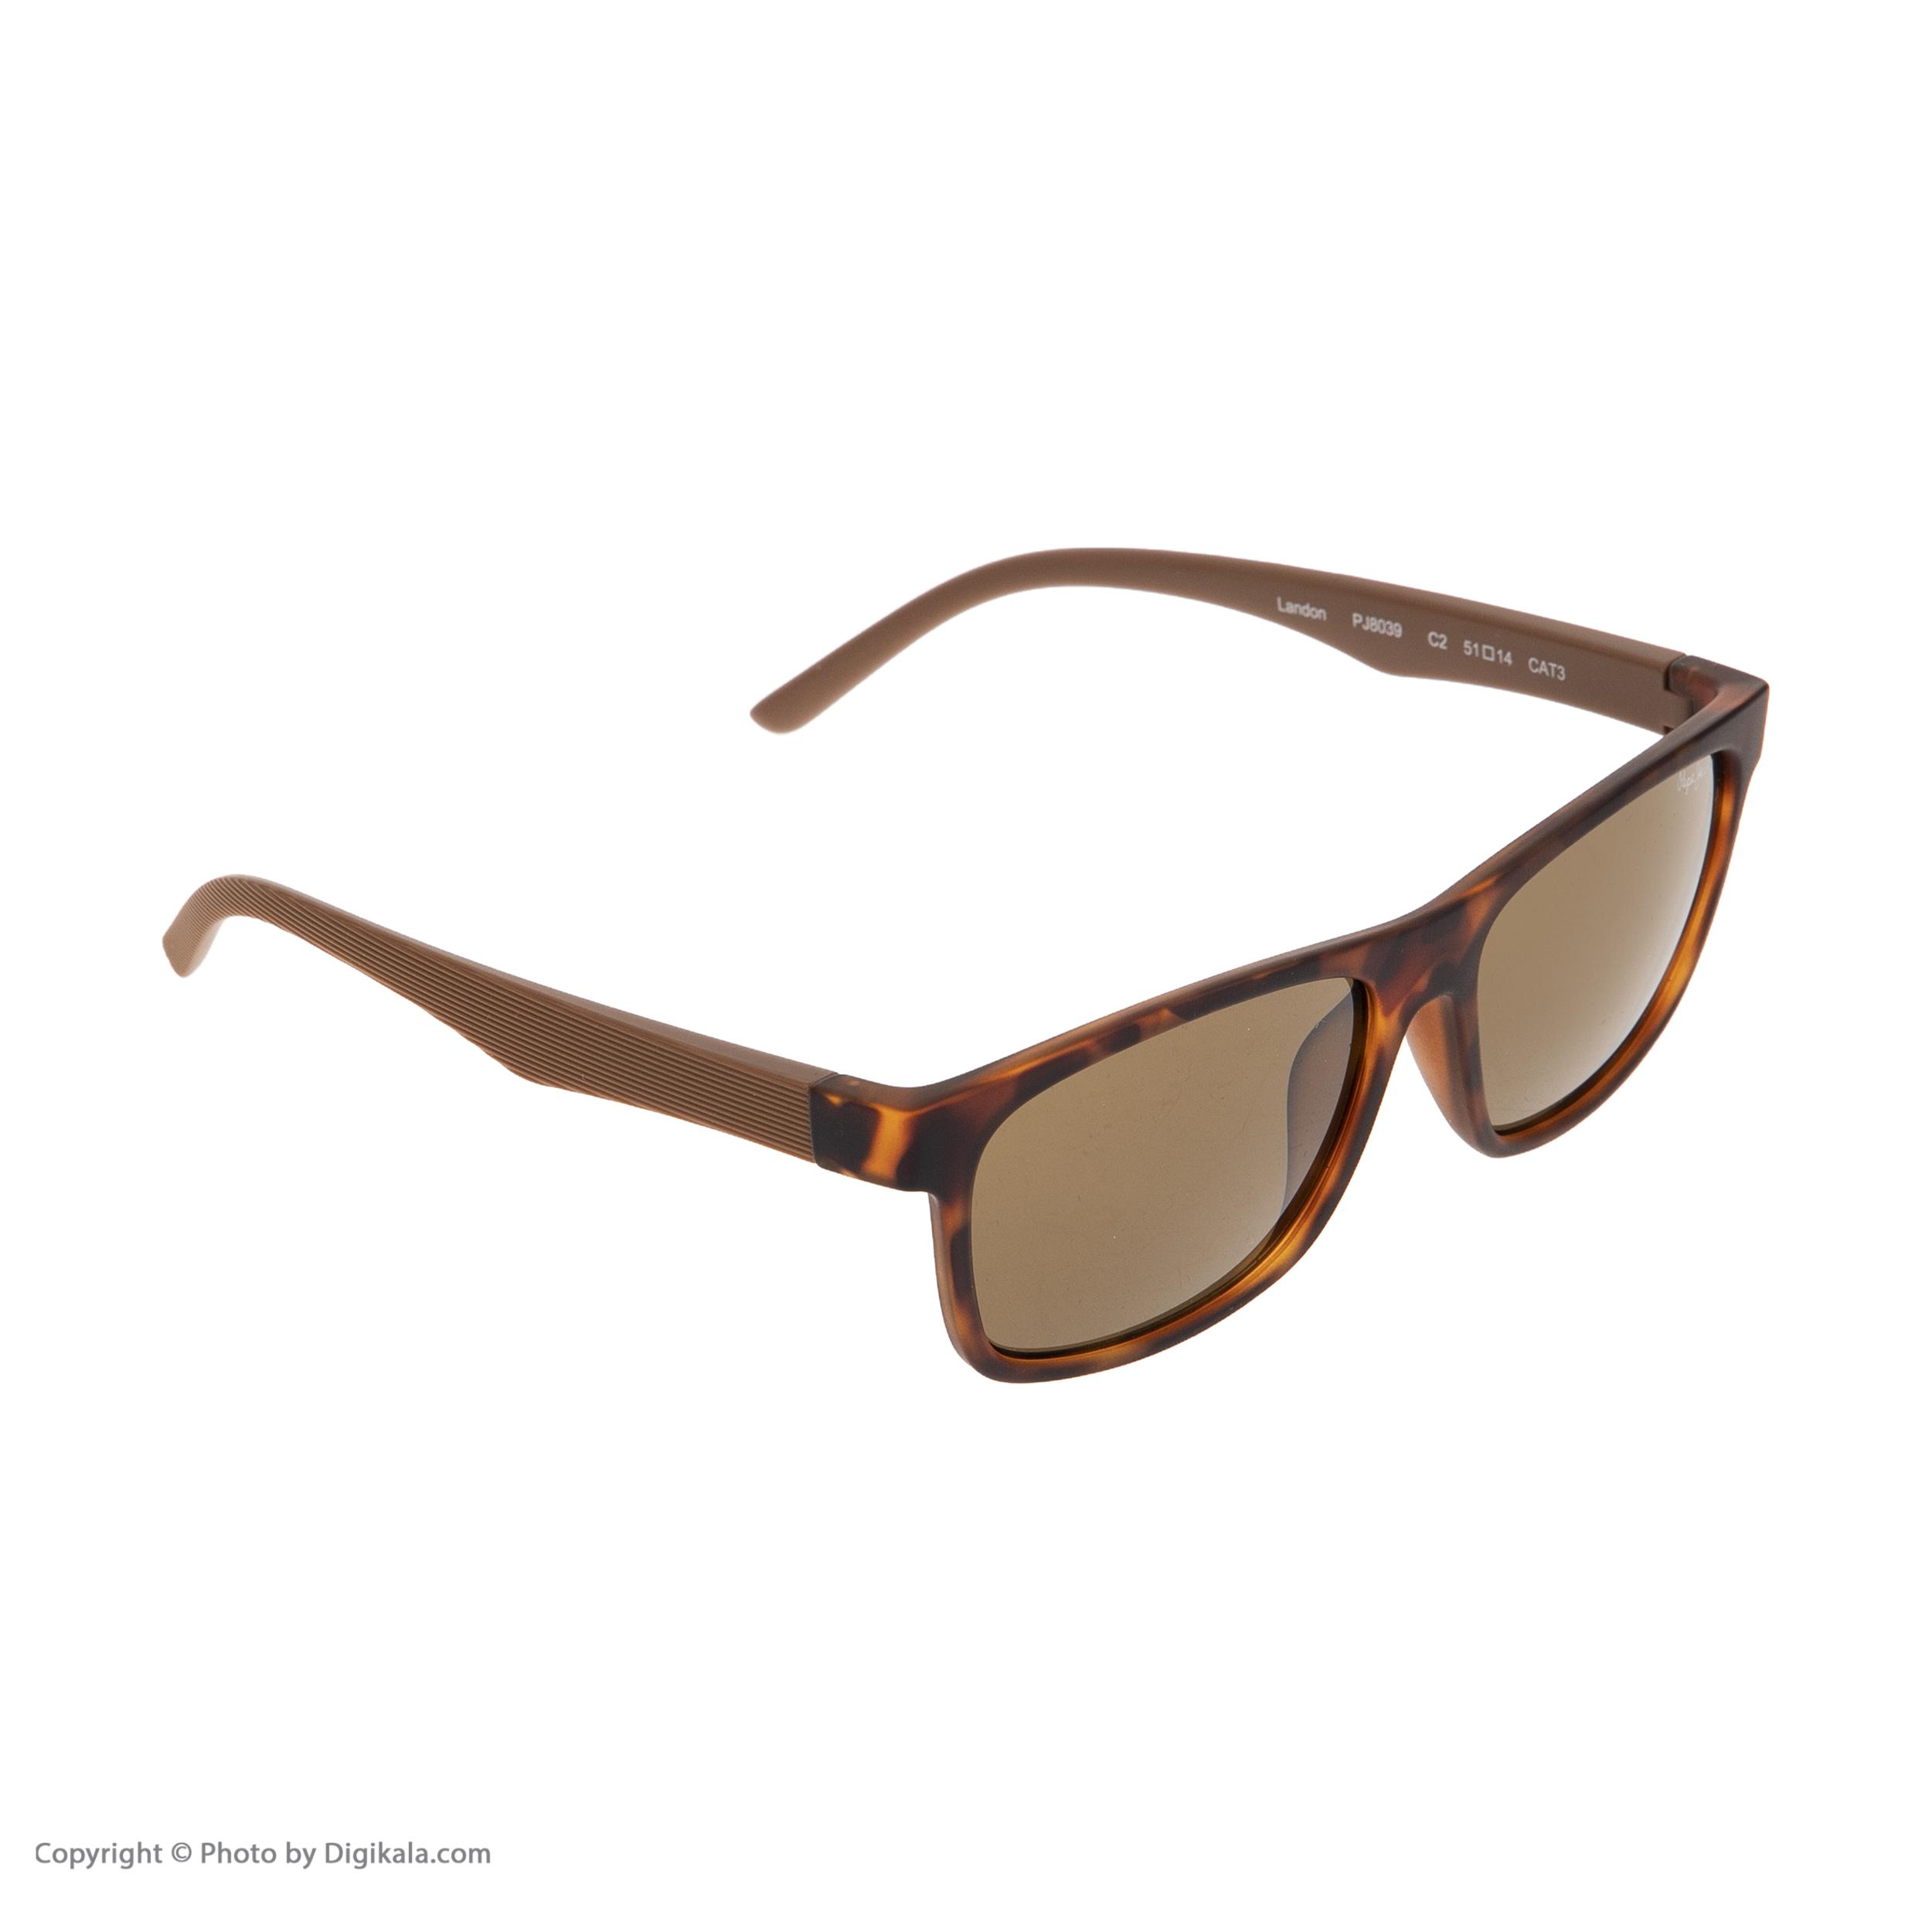 عینک آفتابی زنانه پپه جینز مدل PJ 8039 C2 -  - 3